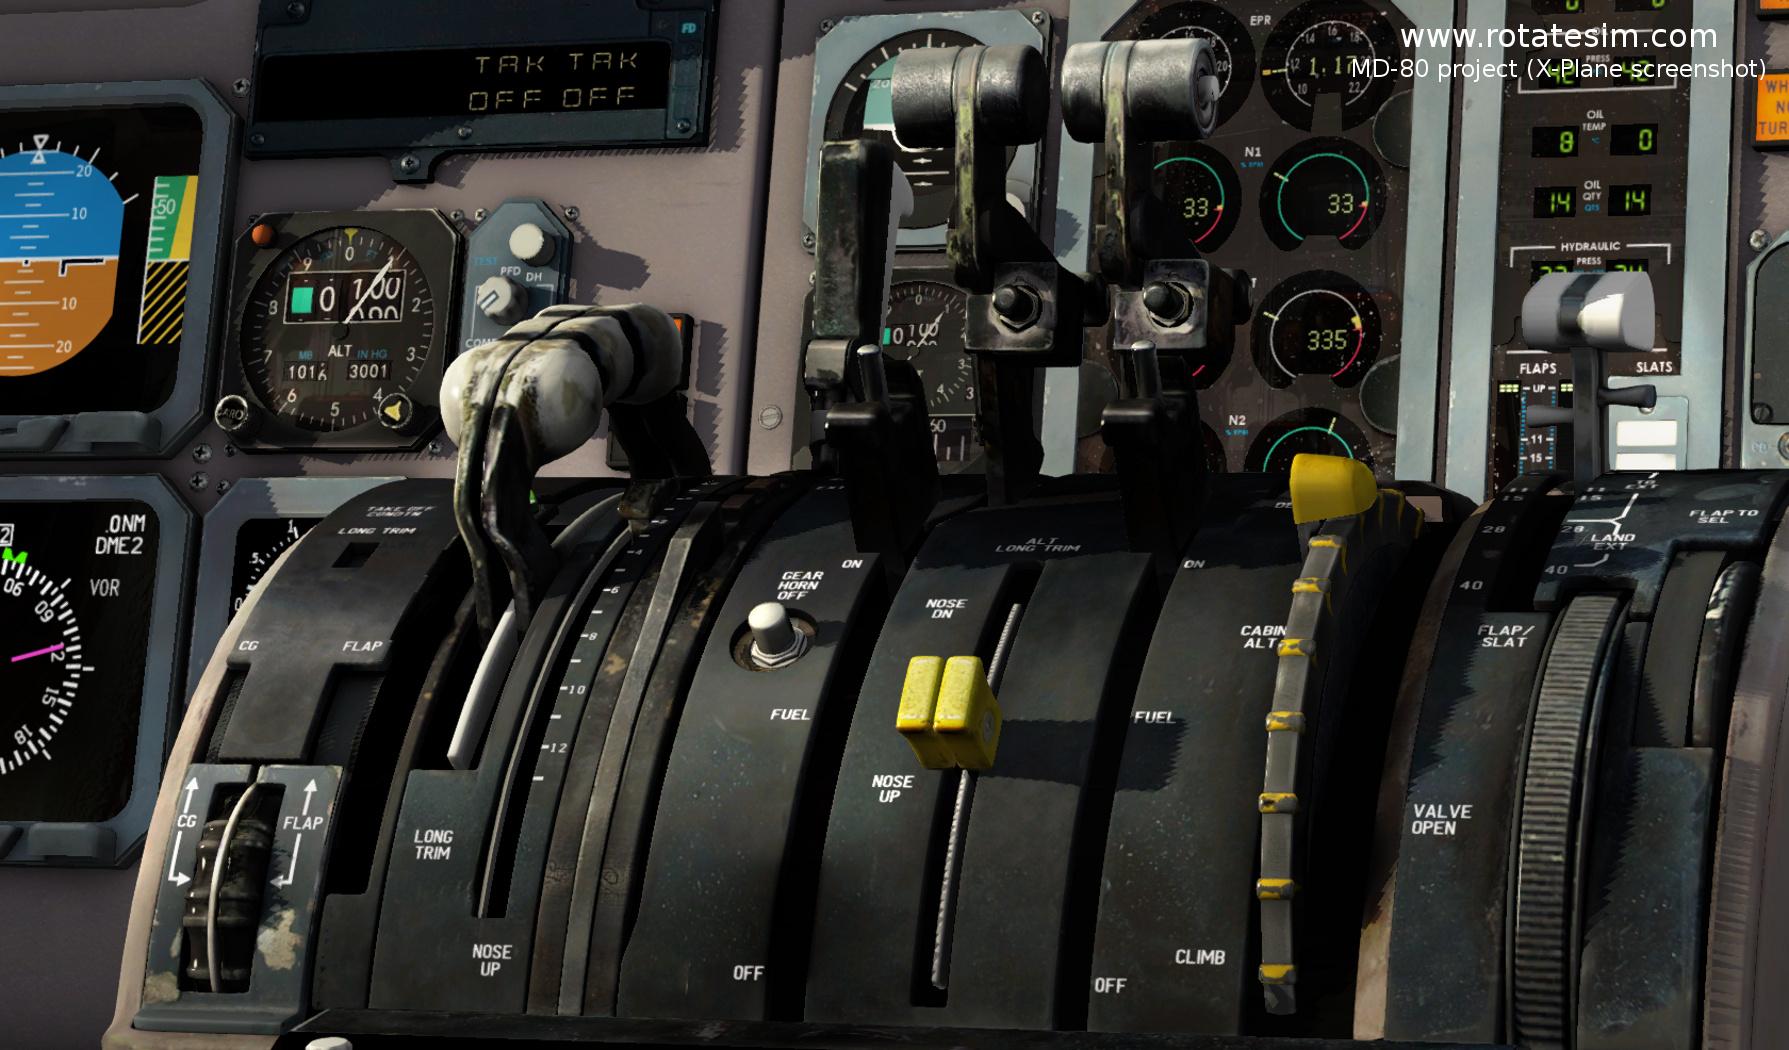 http://rotatesim.com/wp-content/uploads/2014/06/MD-80-screenshot-03.jpg